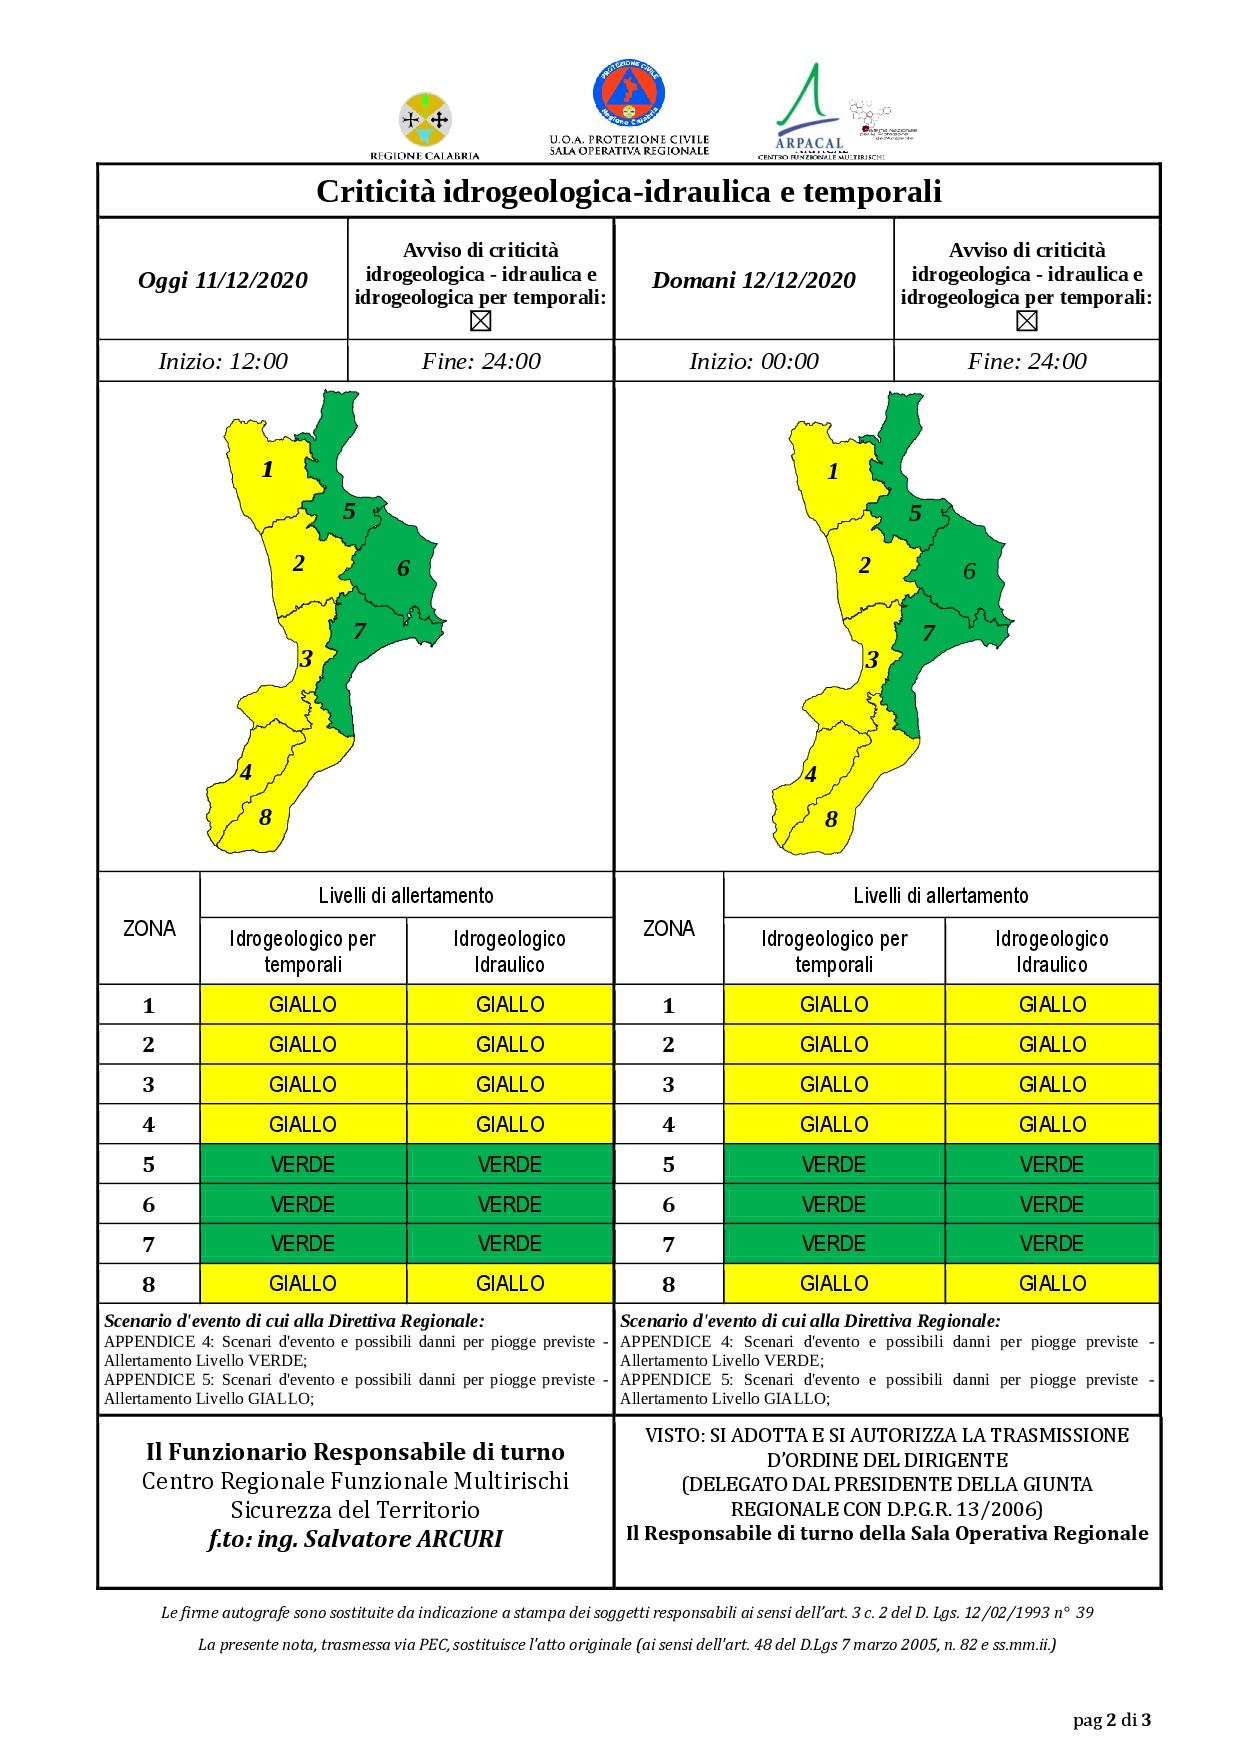 Criticità idrogeologica-idraulica e temporali in Calabria 11-12-2020